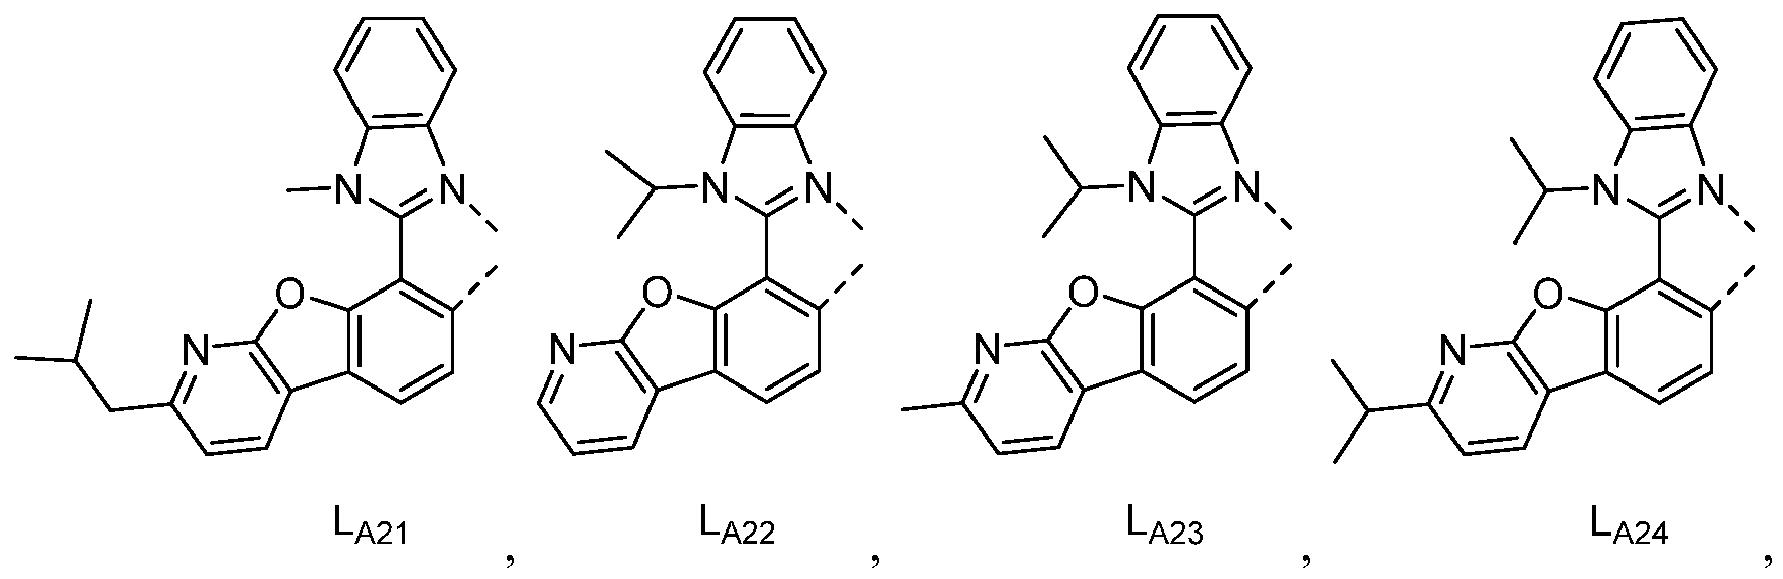 Figure imgb0291